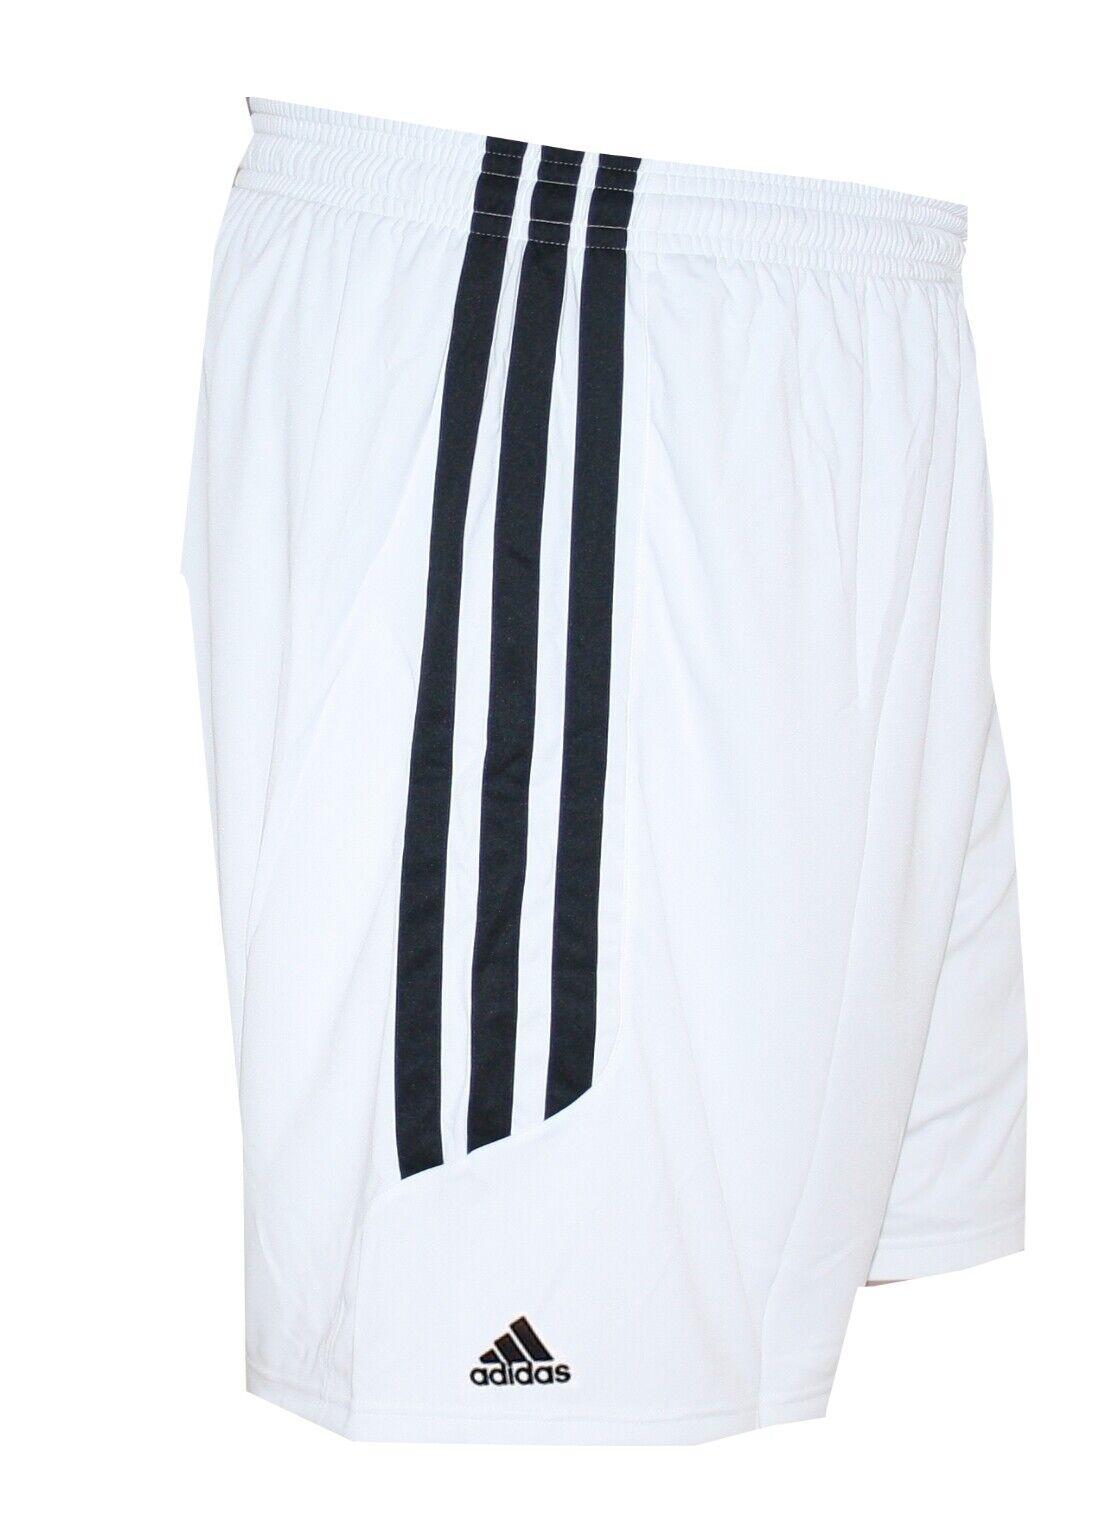 cfdb6eb5ac984e Adidas Herren ClimaLite E Kit 2.0 Short Basketball Hose Sporthose 2XT